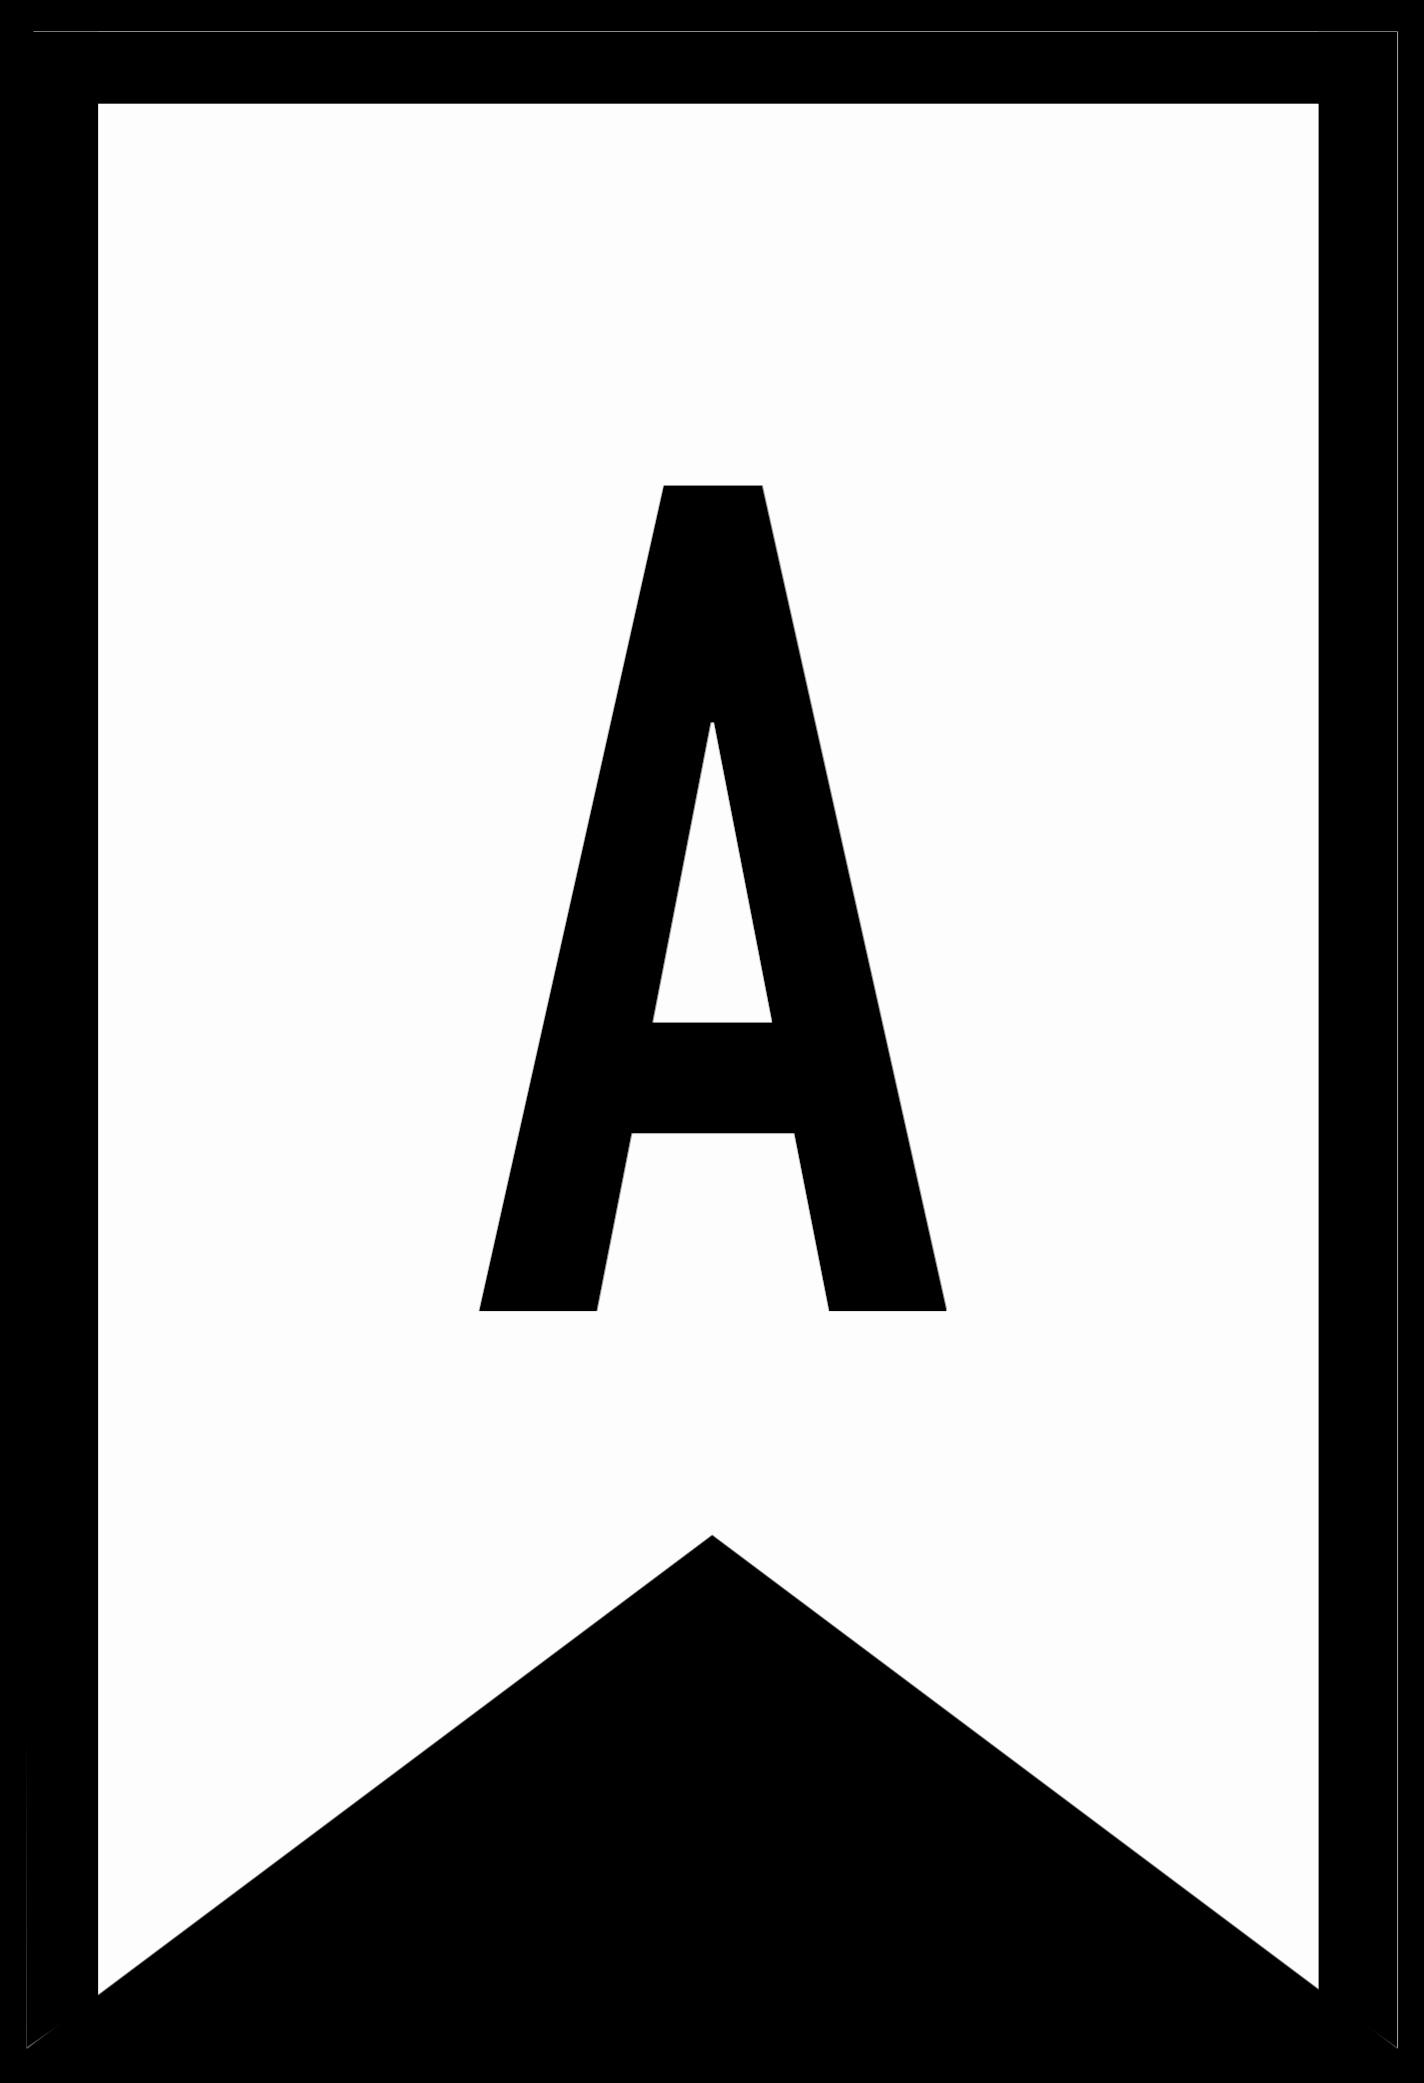 Printable Letters – Basecampjonkoping.se - Free Printable Alphabet Letters For Banners